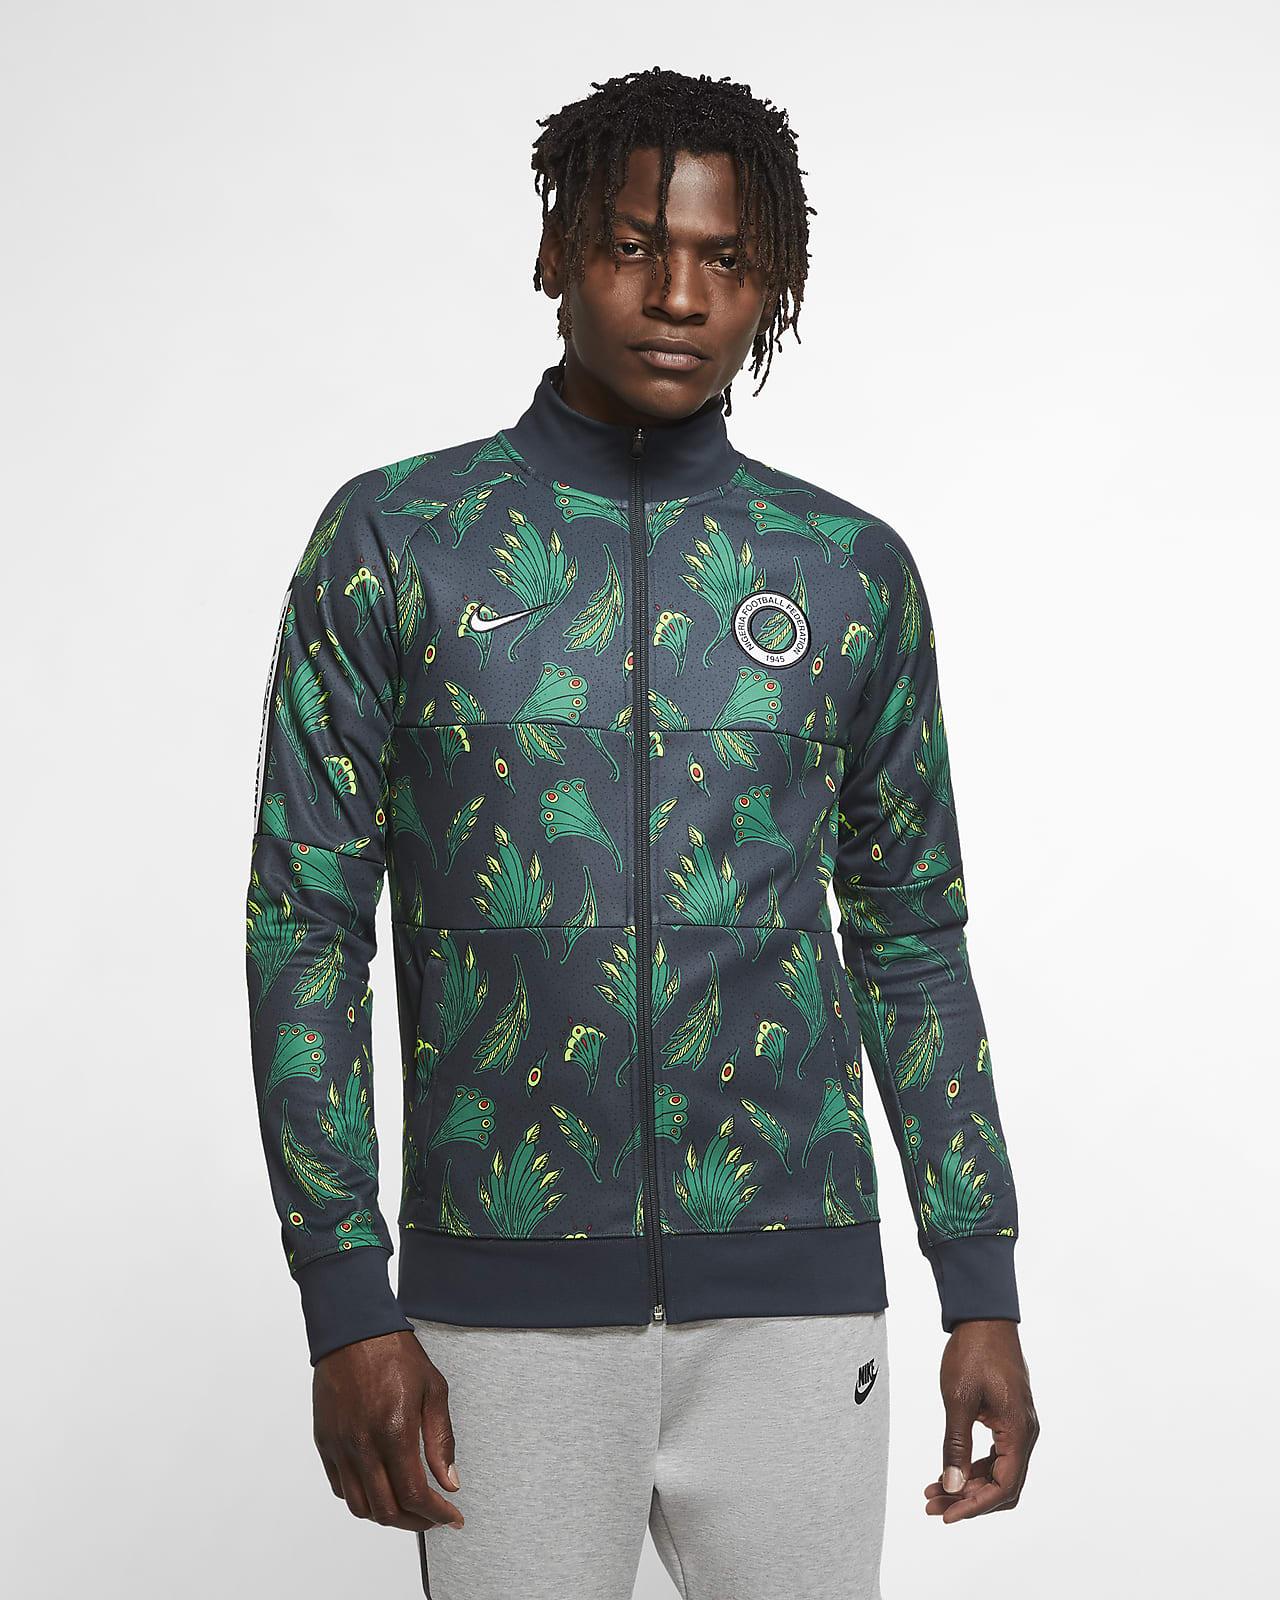 Nigeria Men's Soccer Track Jacket